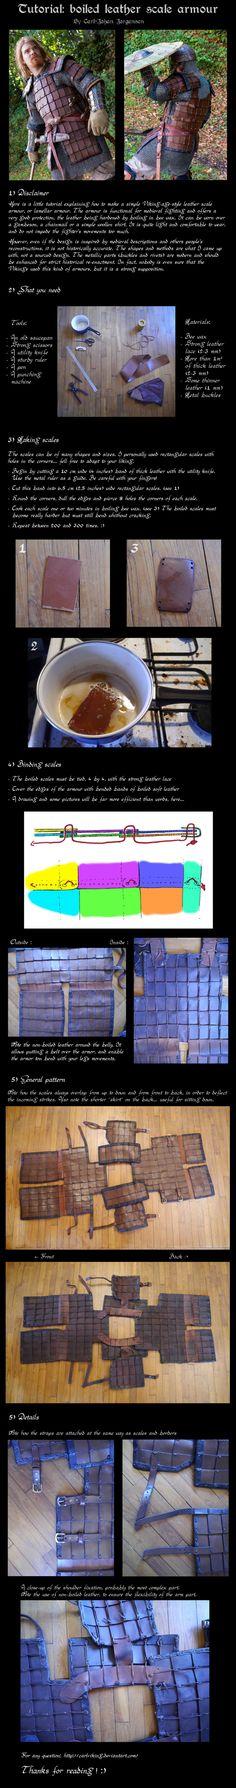 territorioVIKINGO: Tutorial de armadura laminar de cuero